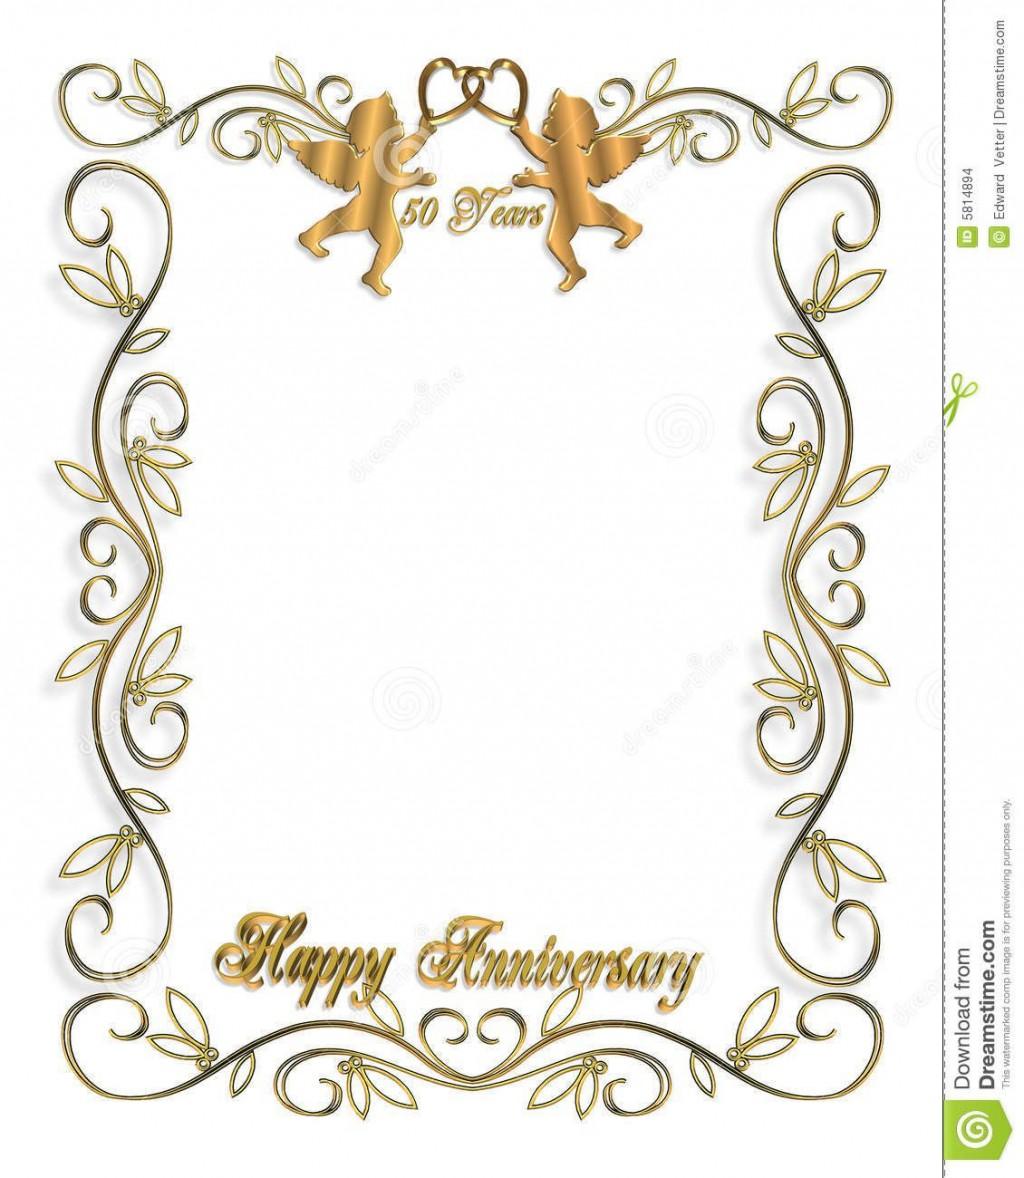 011 Imposing 50th Anniversary Party Invitation Template Design  Templates Golden Wedding Uk Microsoft Word FreeLarge